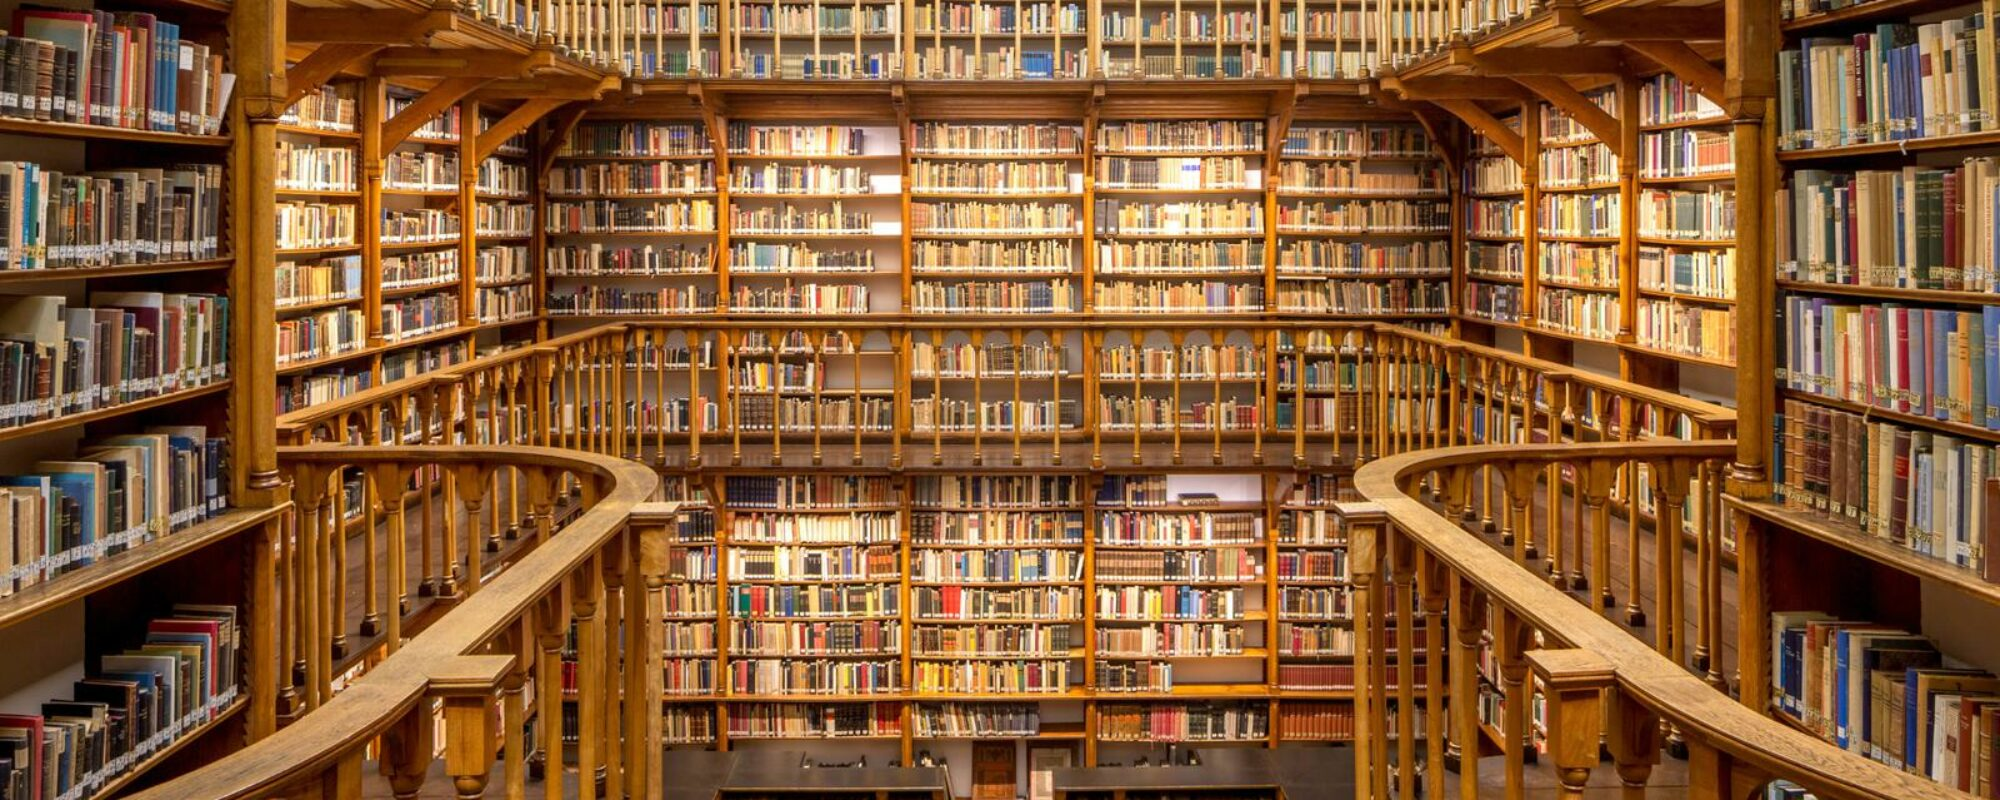 Jesuitenbibliothekt